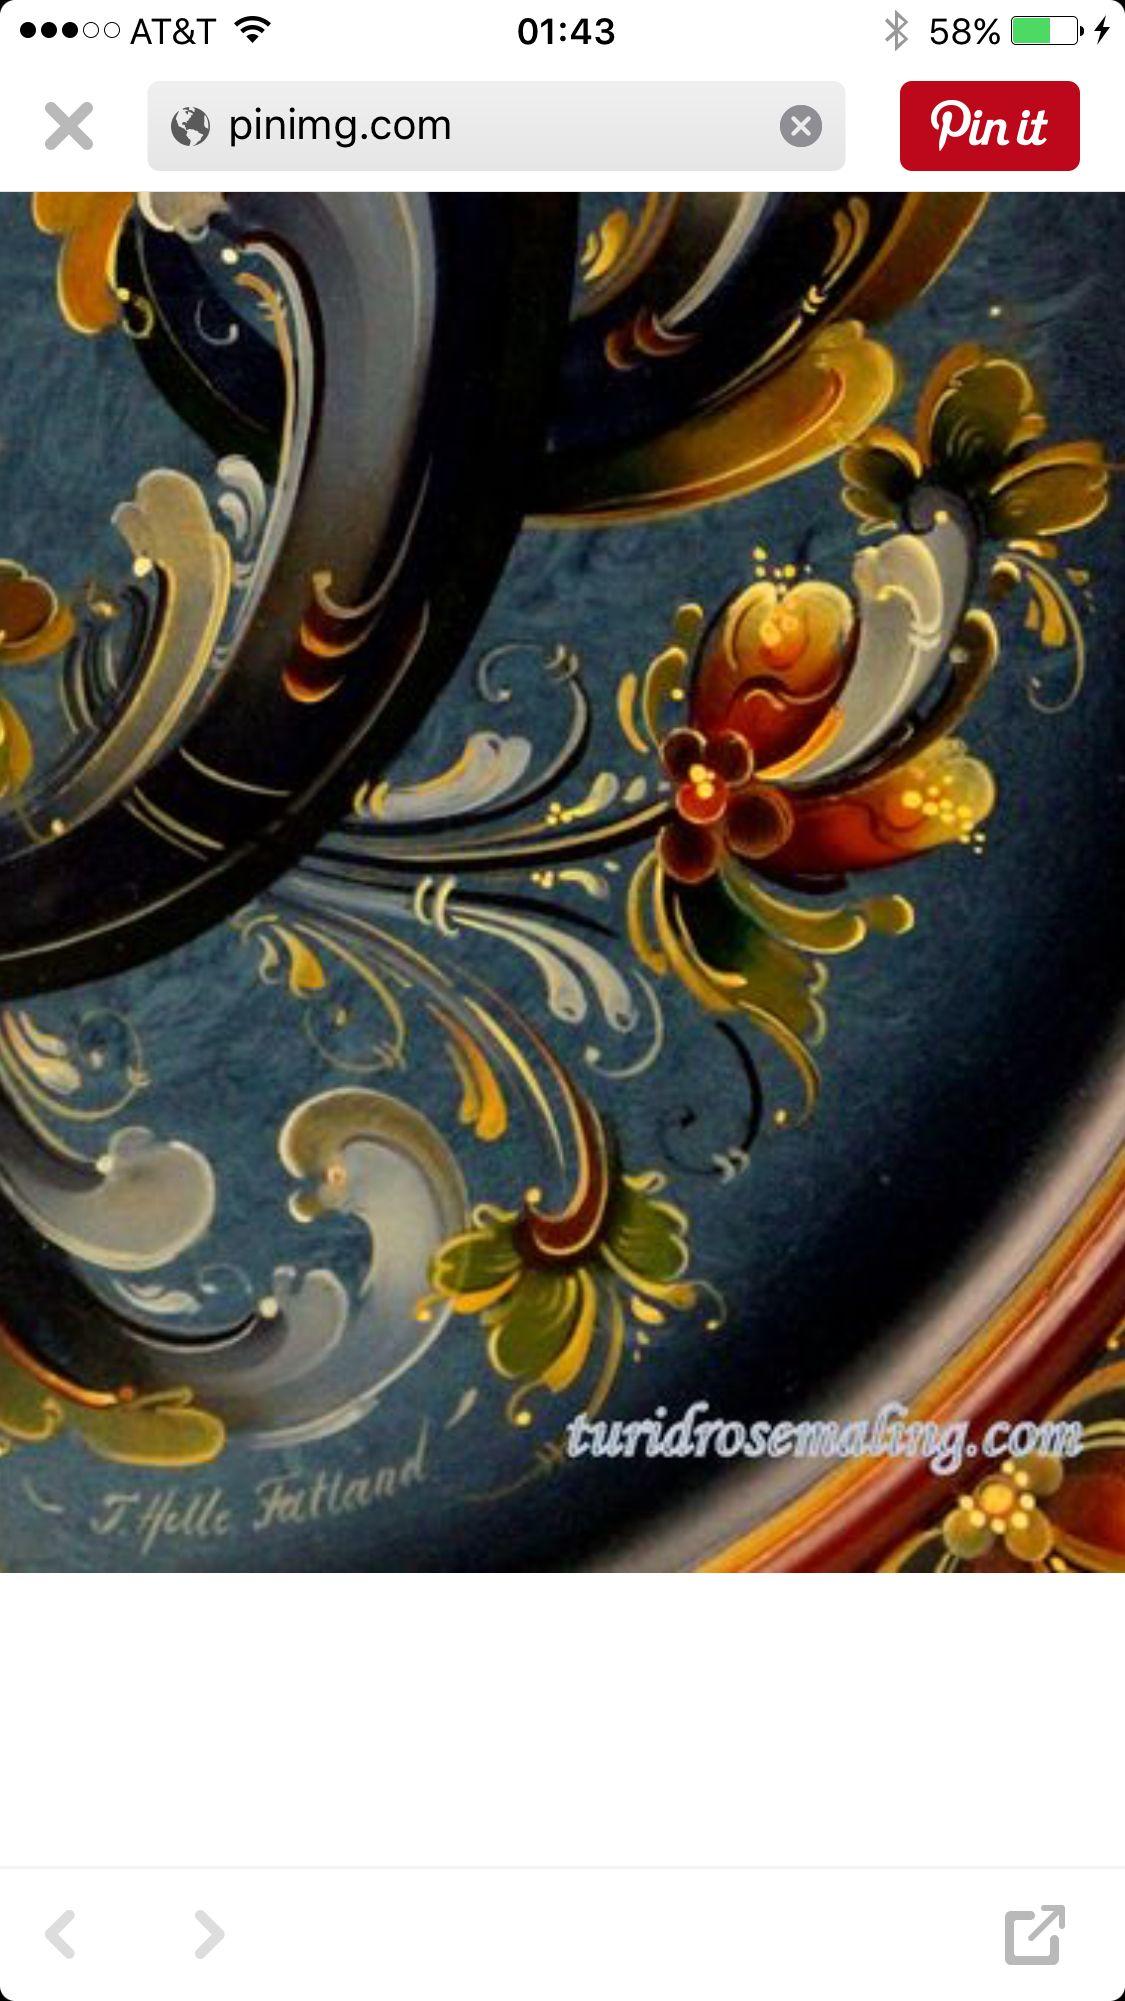 1000 images about folk art on pinterest norwegian rosemaling folk art and nancy morgan - Painting tool avis ...